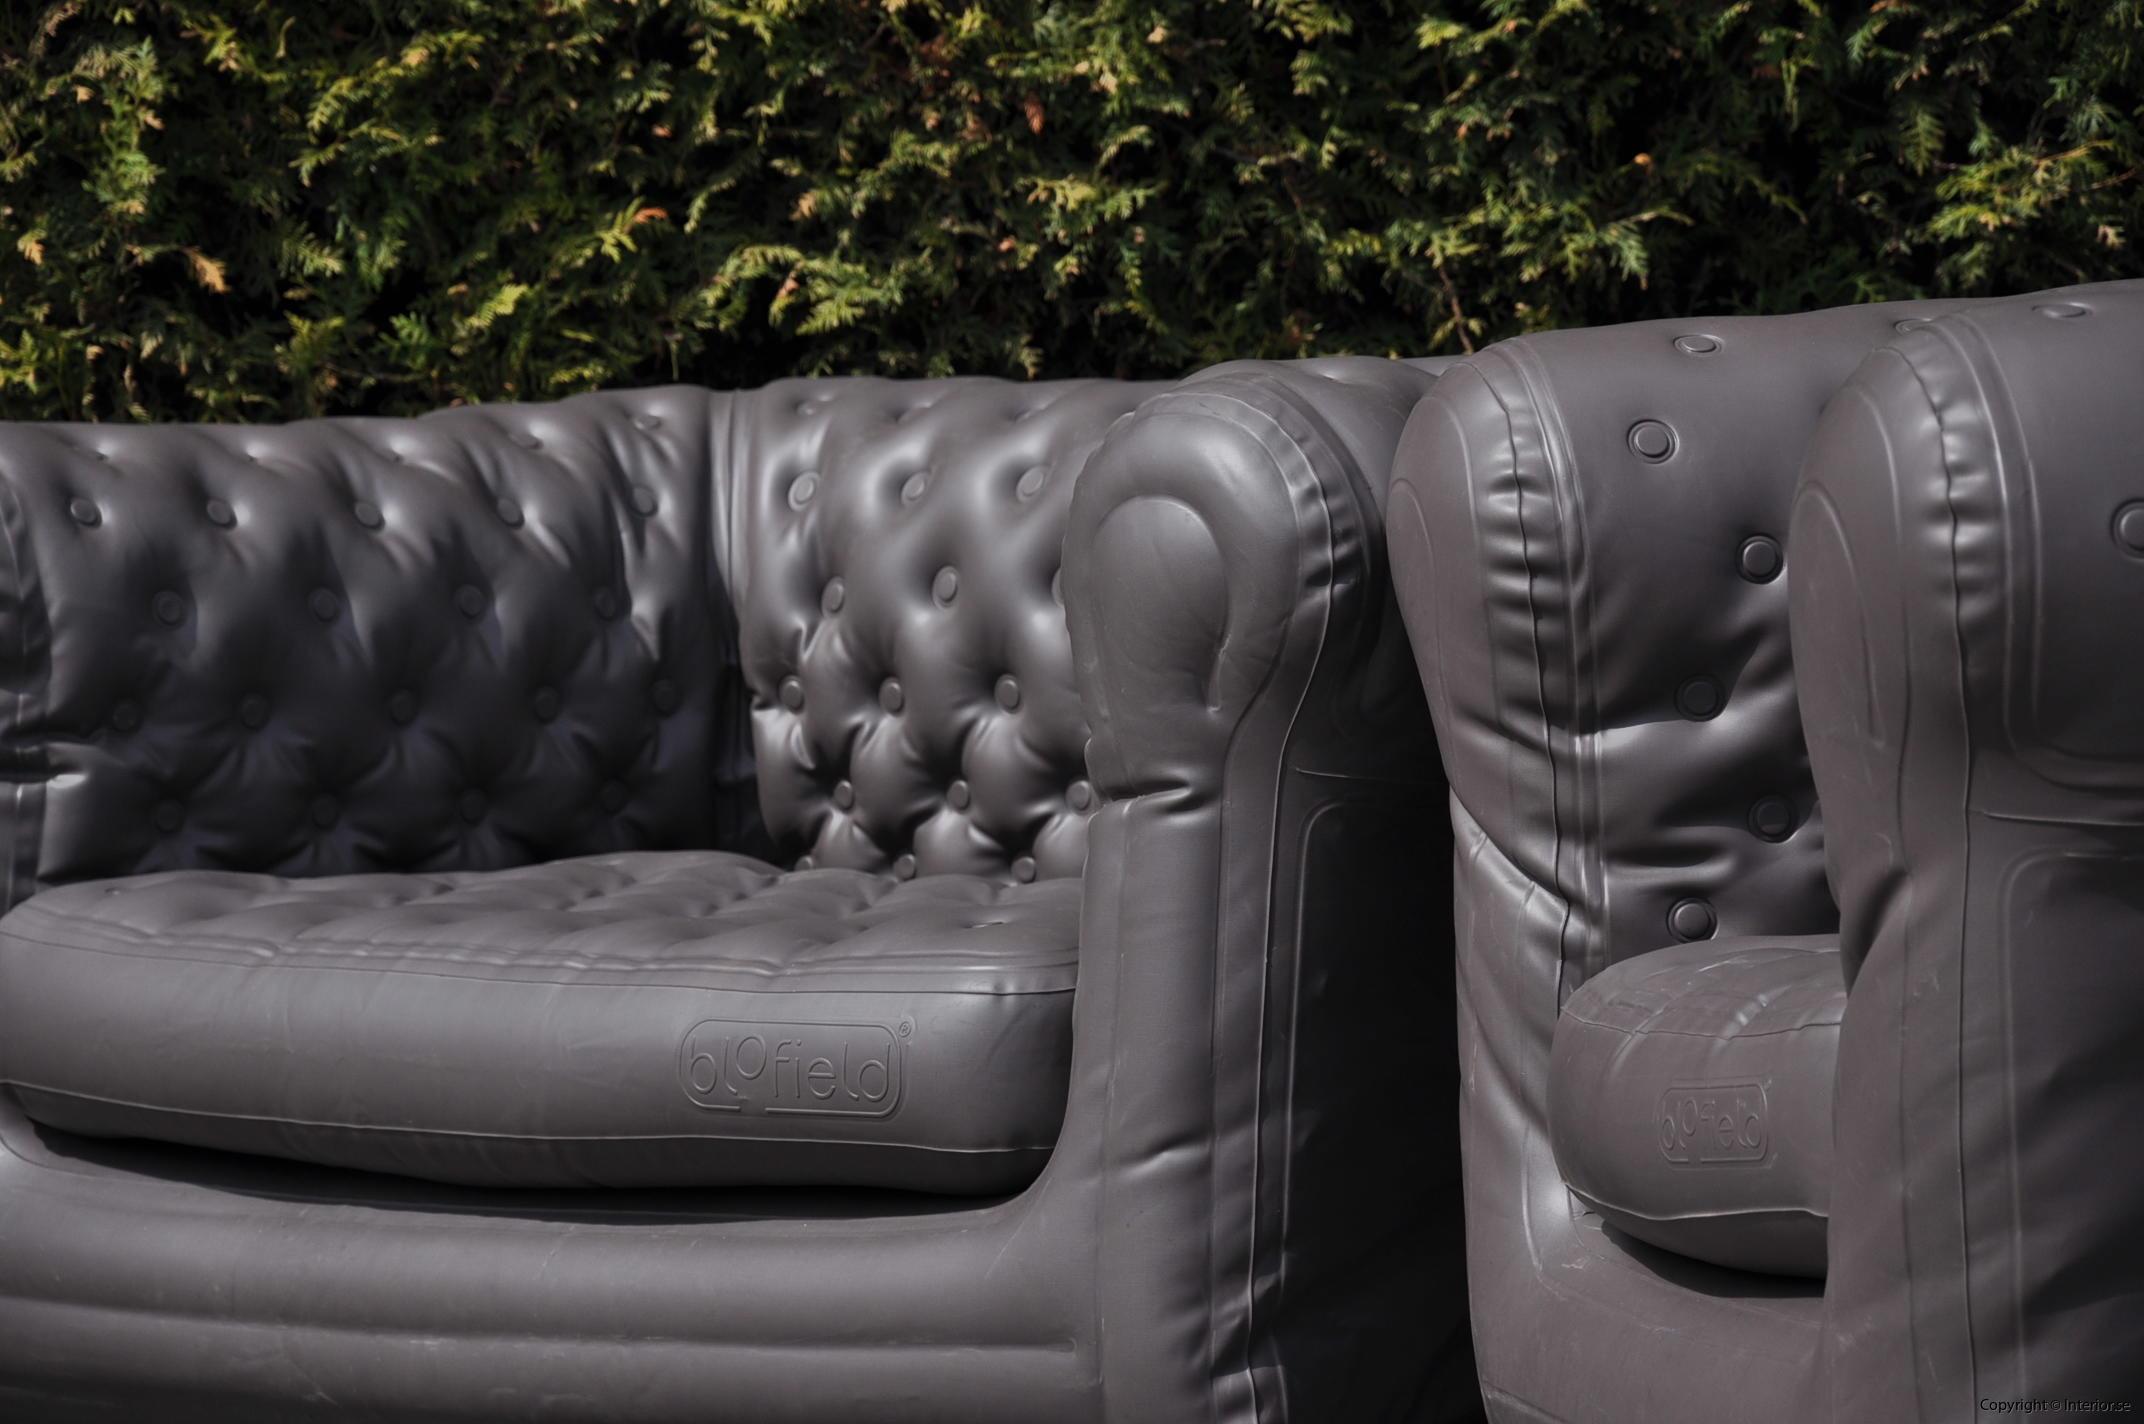 hyra uppblåsbara möbler hyr möbler event stockholm blofield furniture event sweden (3)